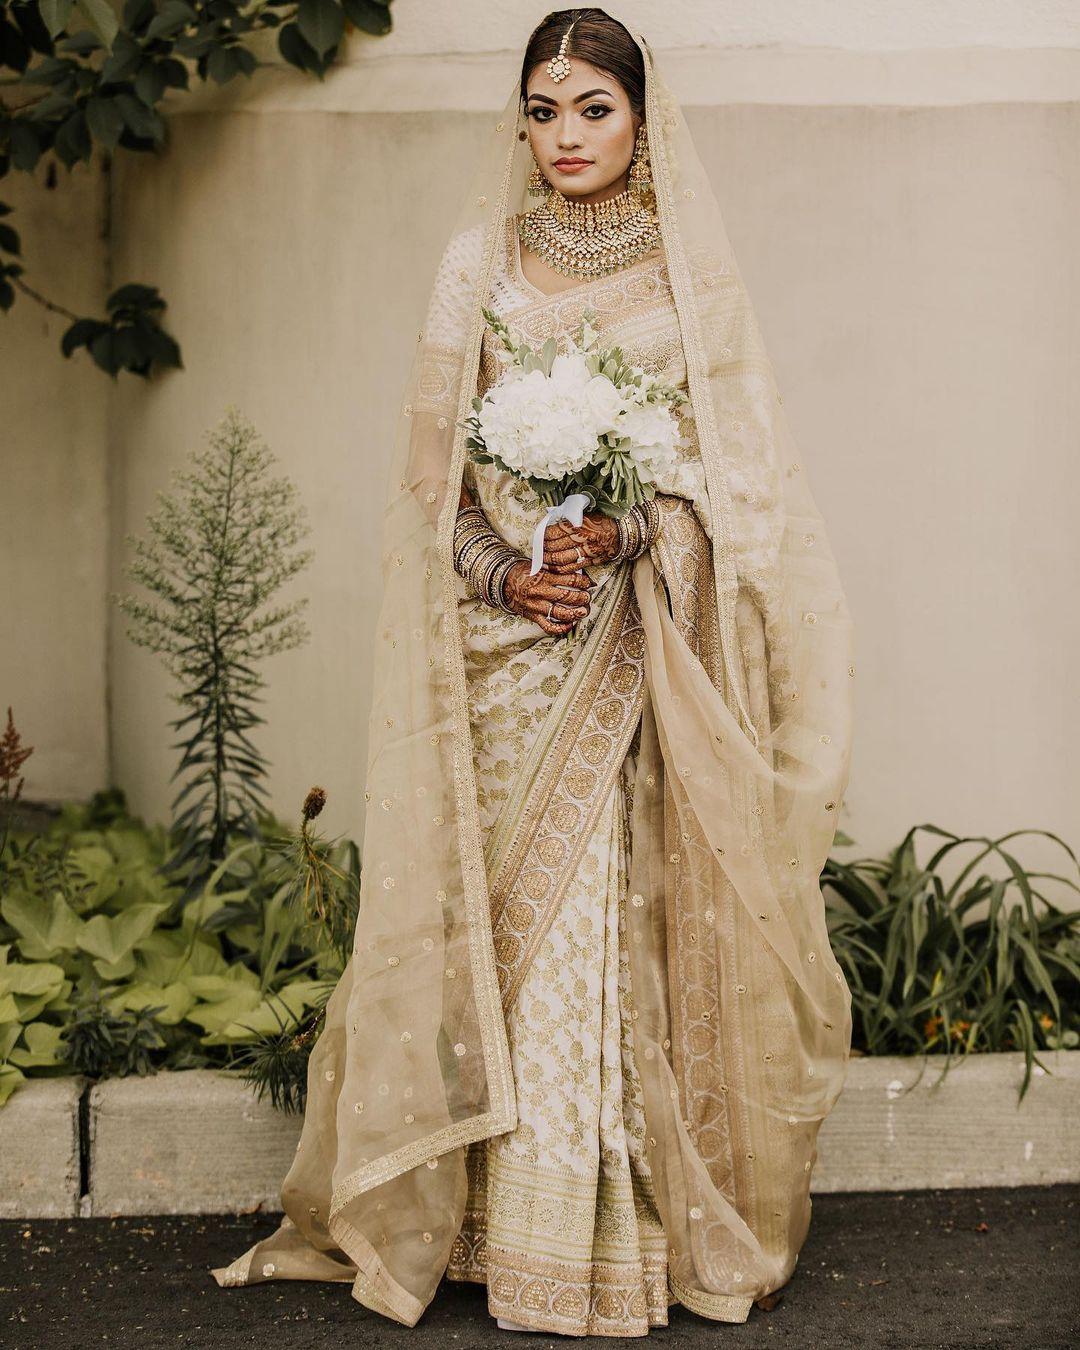 Sabyasachi christian bride